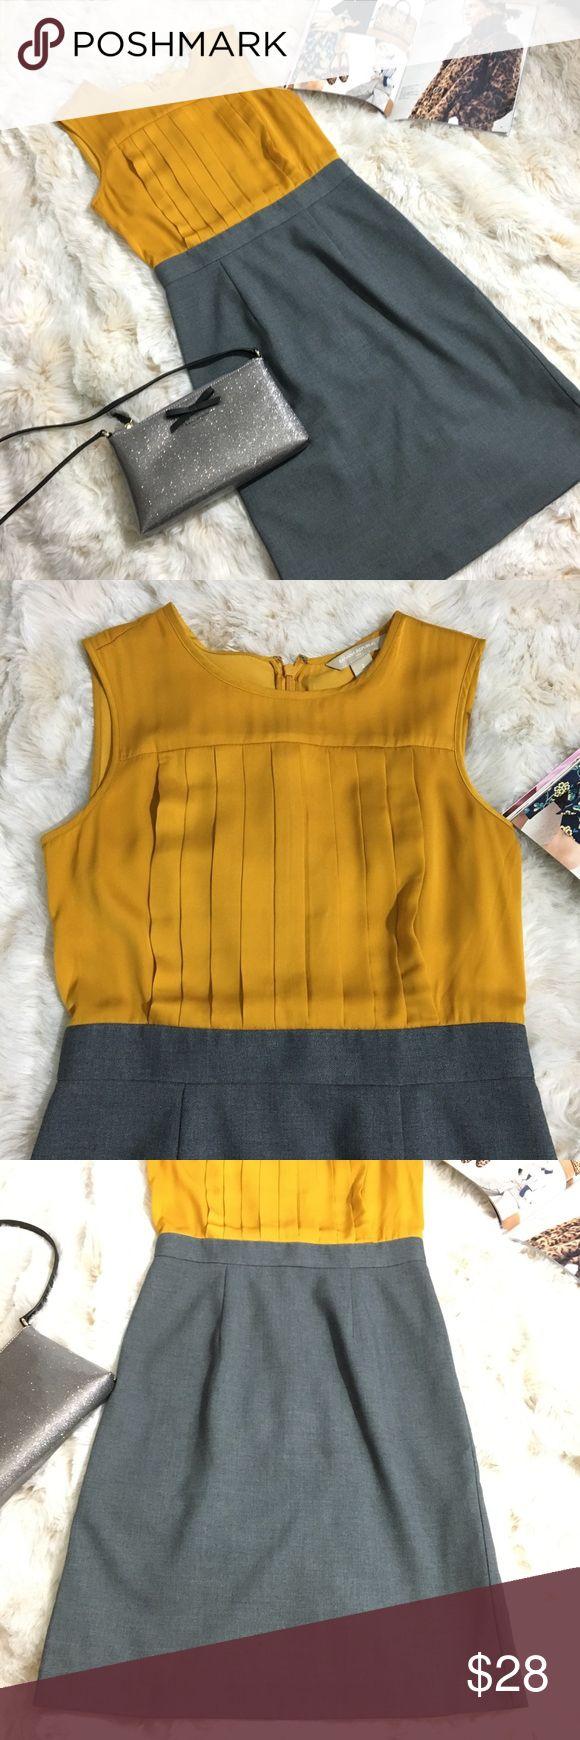 Banana Republic yellow & gray office work dress 2 Banana Republic sleeveless dre…